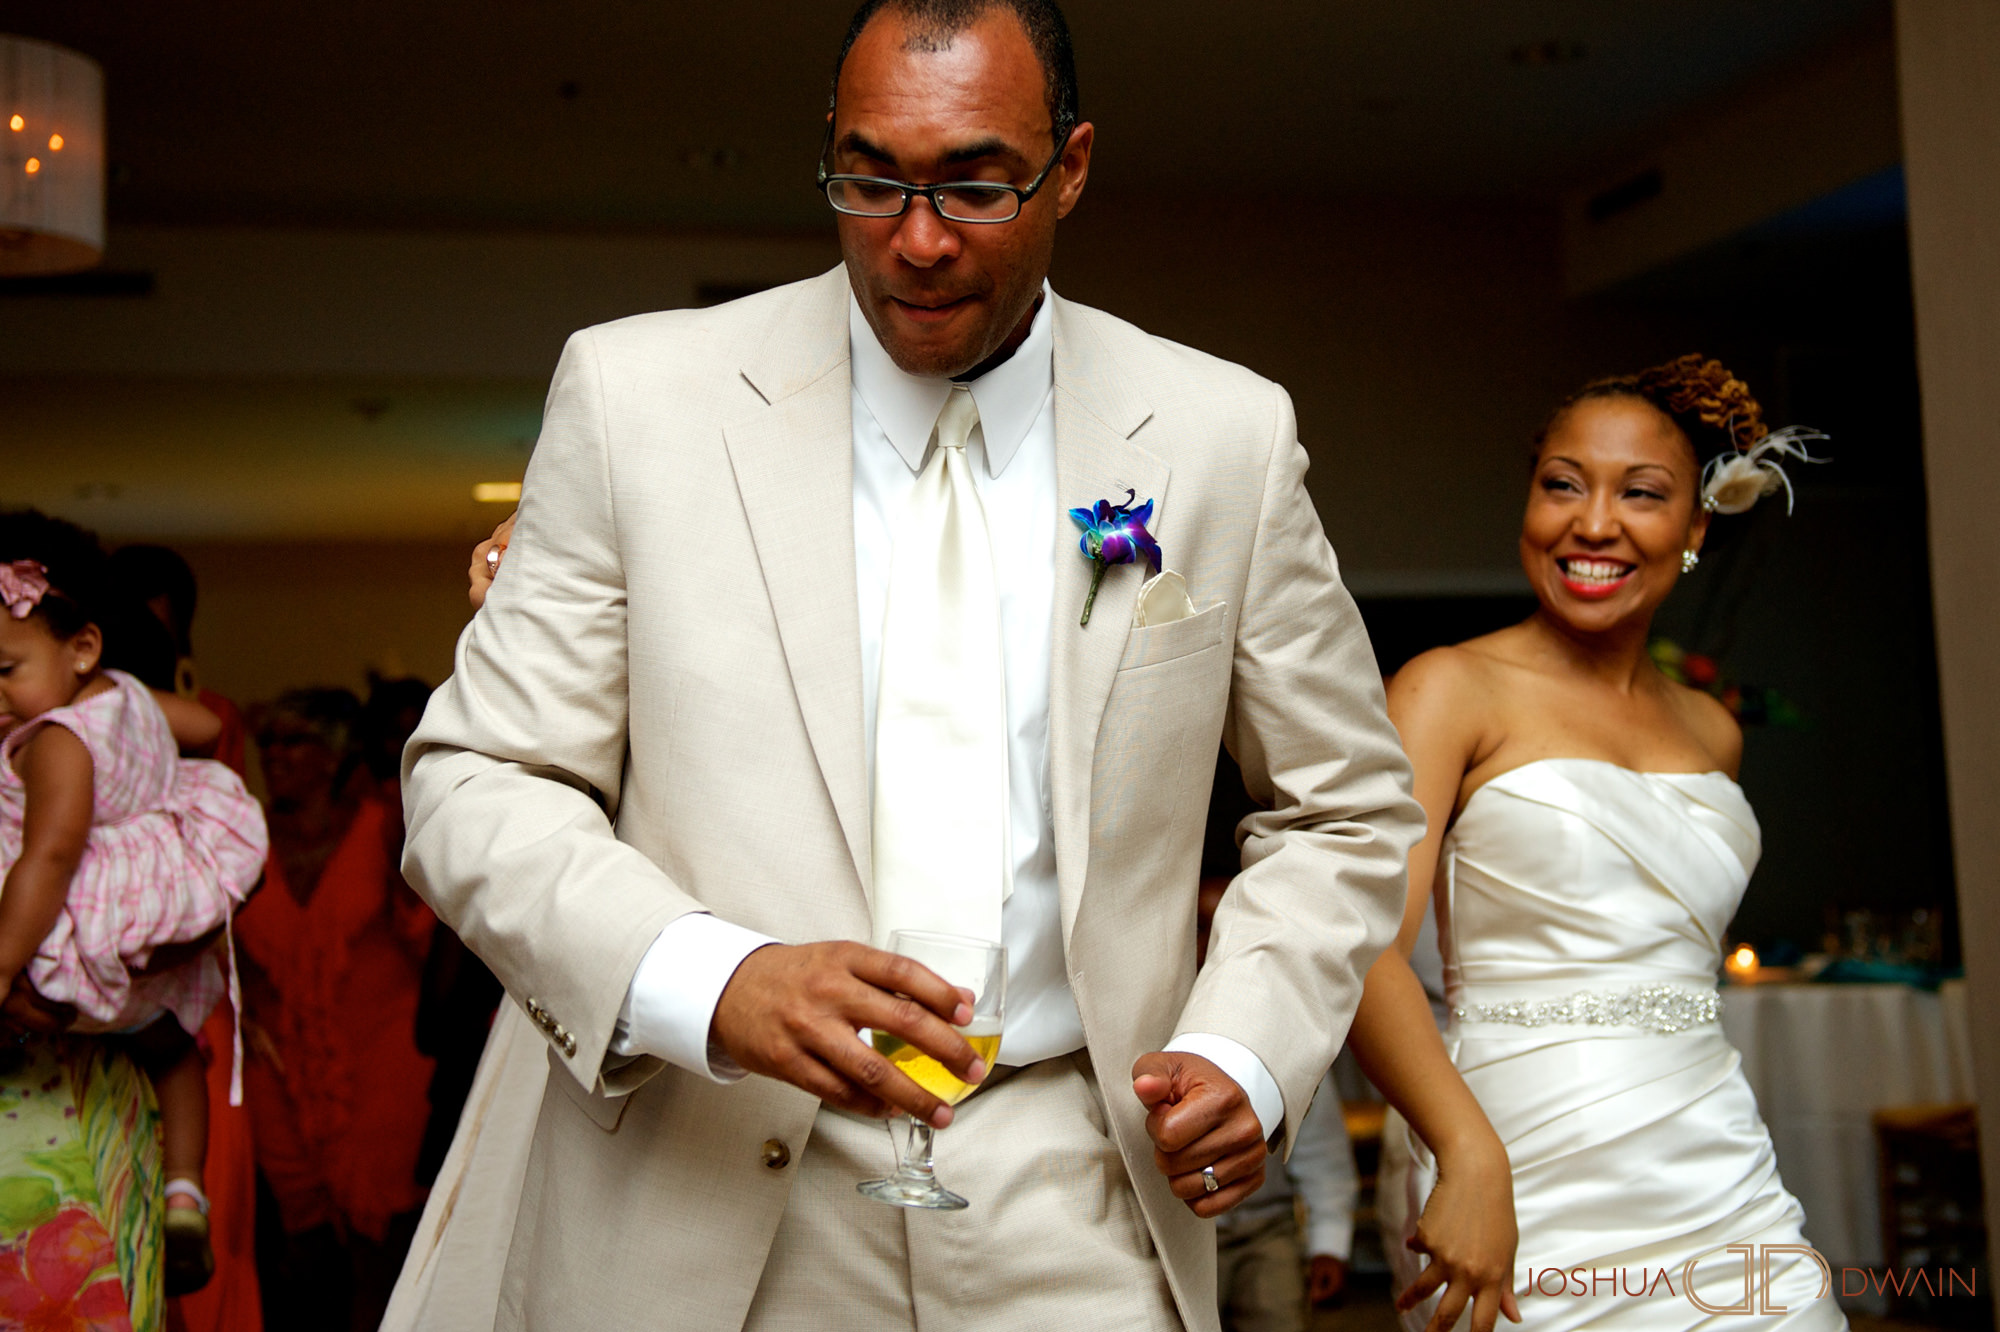 candra-alonza-012-holiday-inn-south-beach-miami-wedding-photographer-joshua-dwain-2012-07-28_ca_341